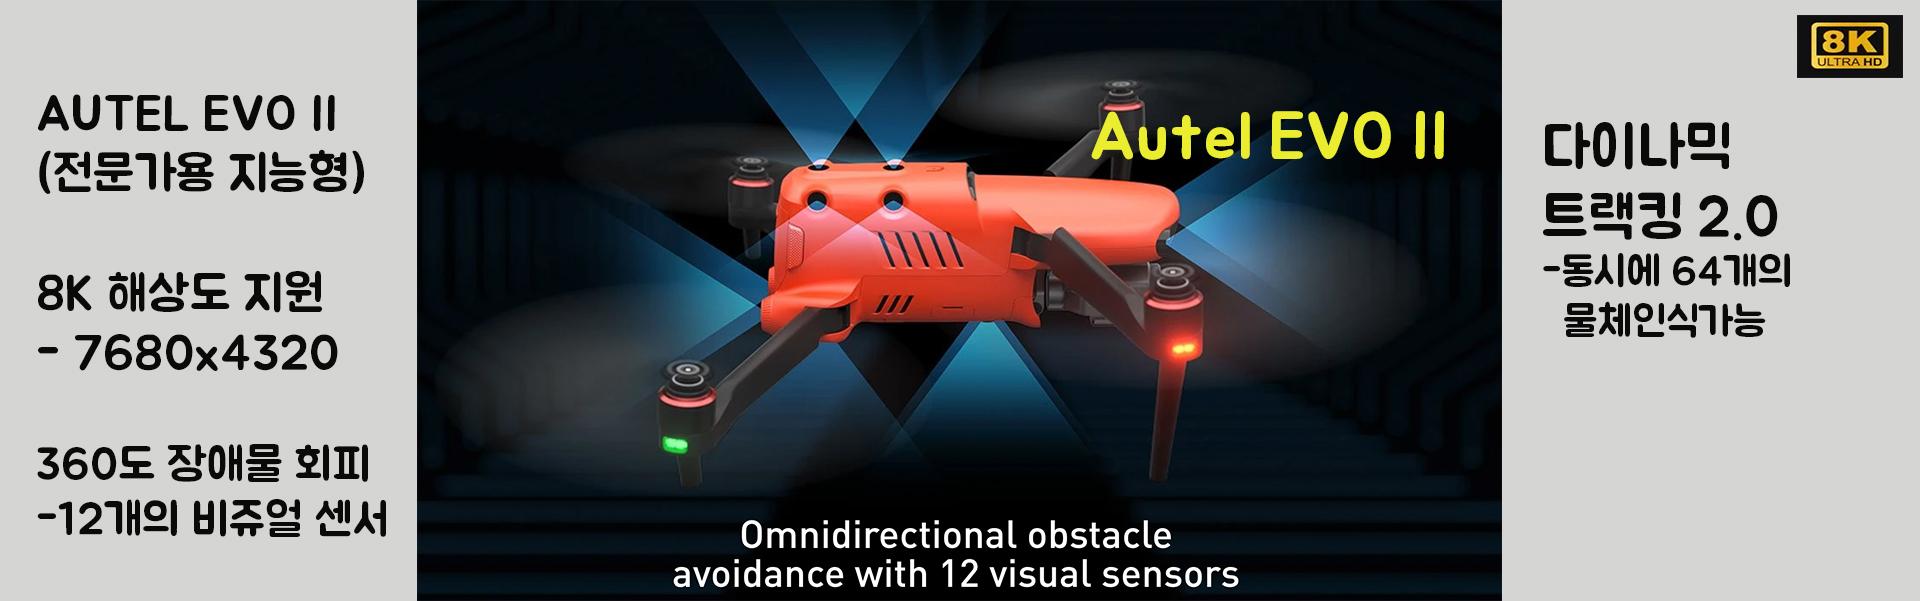 Autel Robotics 드론 공식판매사 덕유항공(주) 오텔 EVO II, EVO II Pro, EVO II Dual 드론 판매처